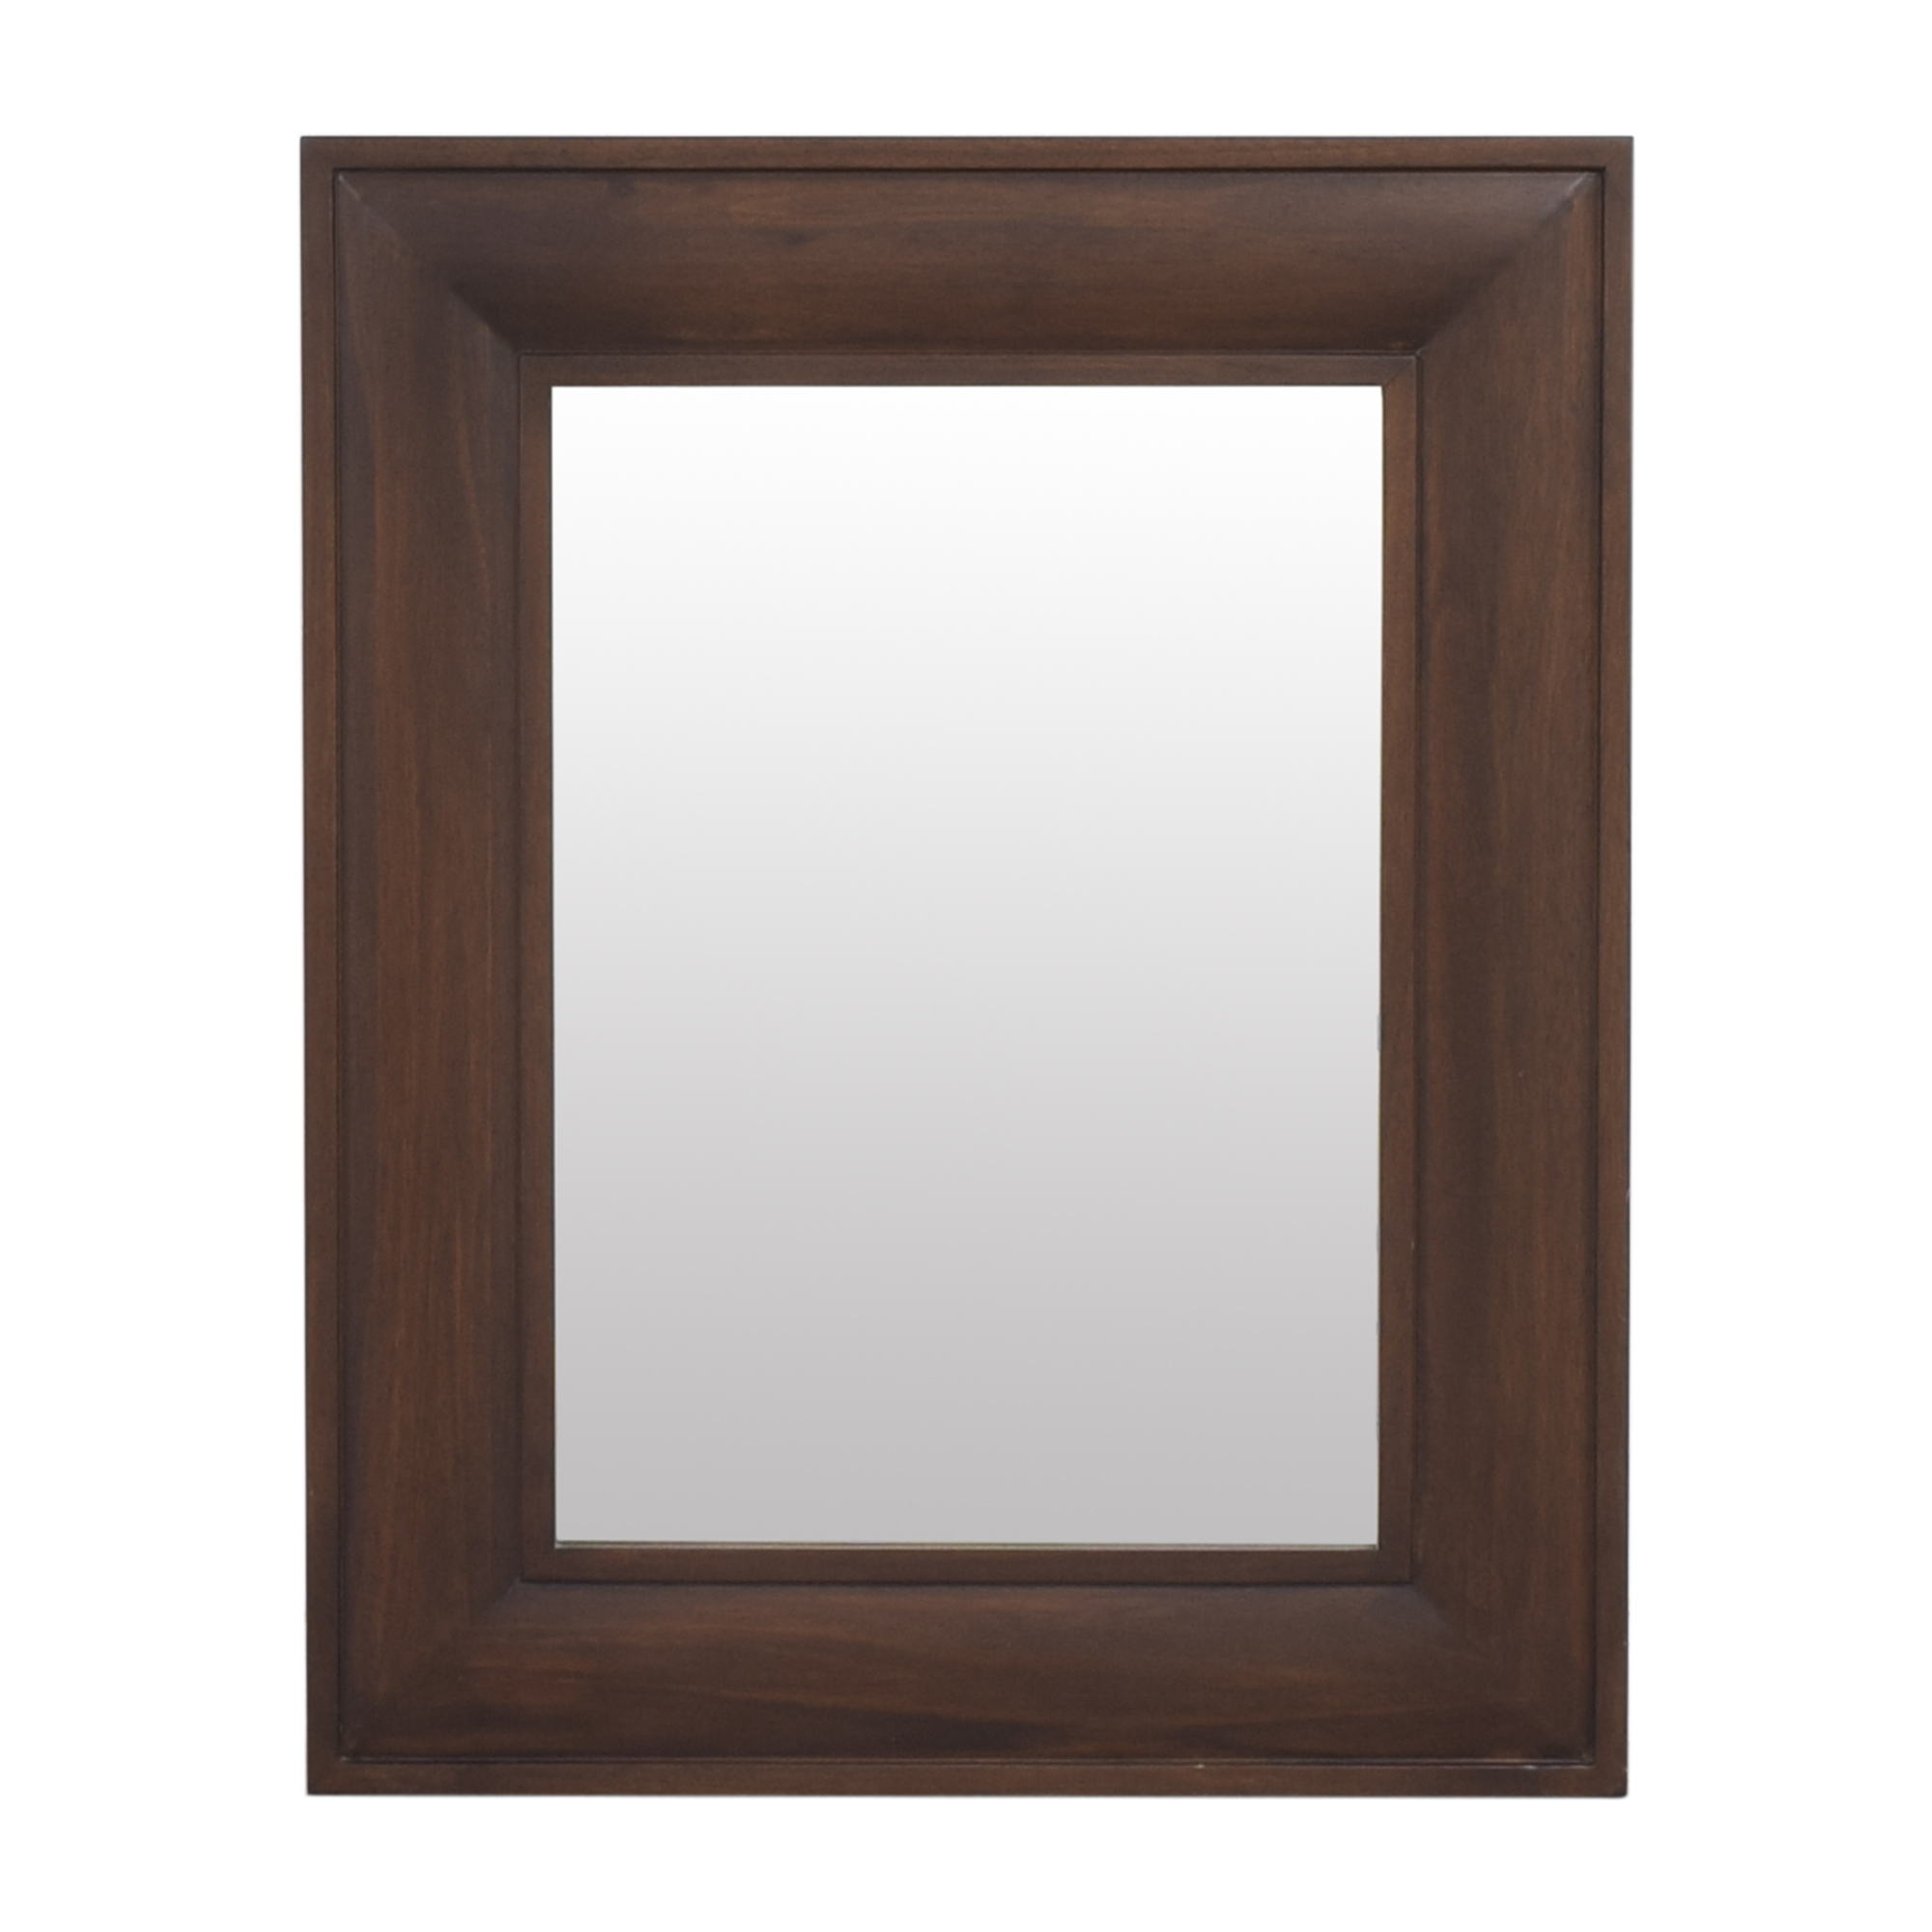 Pottery Barn Pottery Barn Framed Wall Mirror price